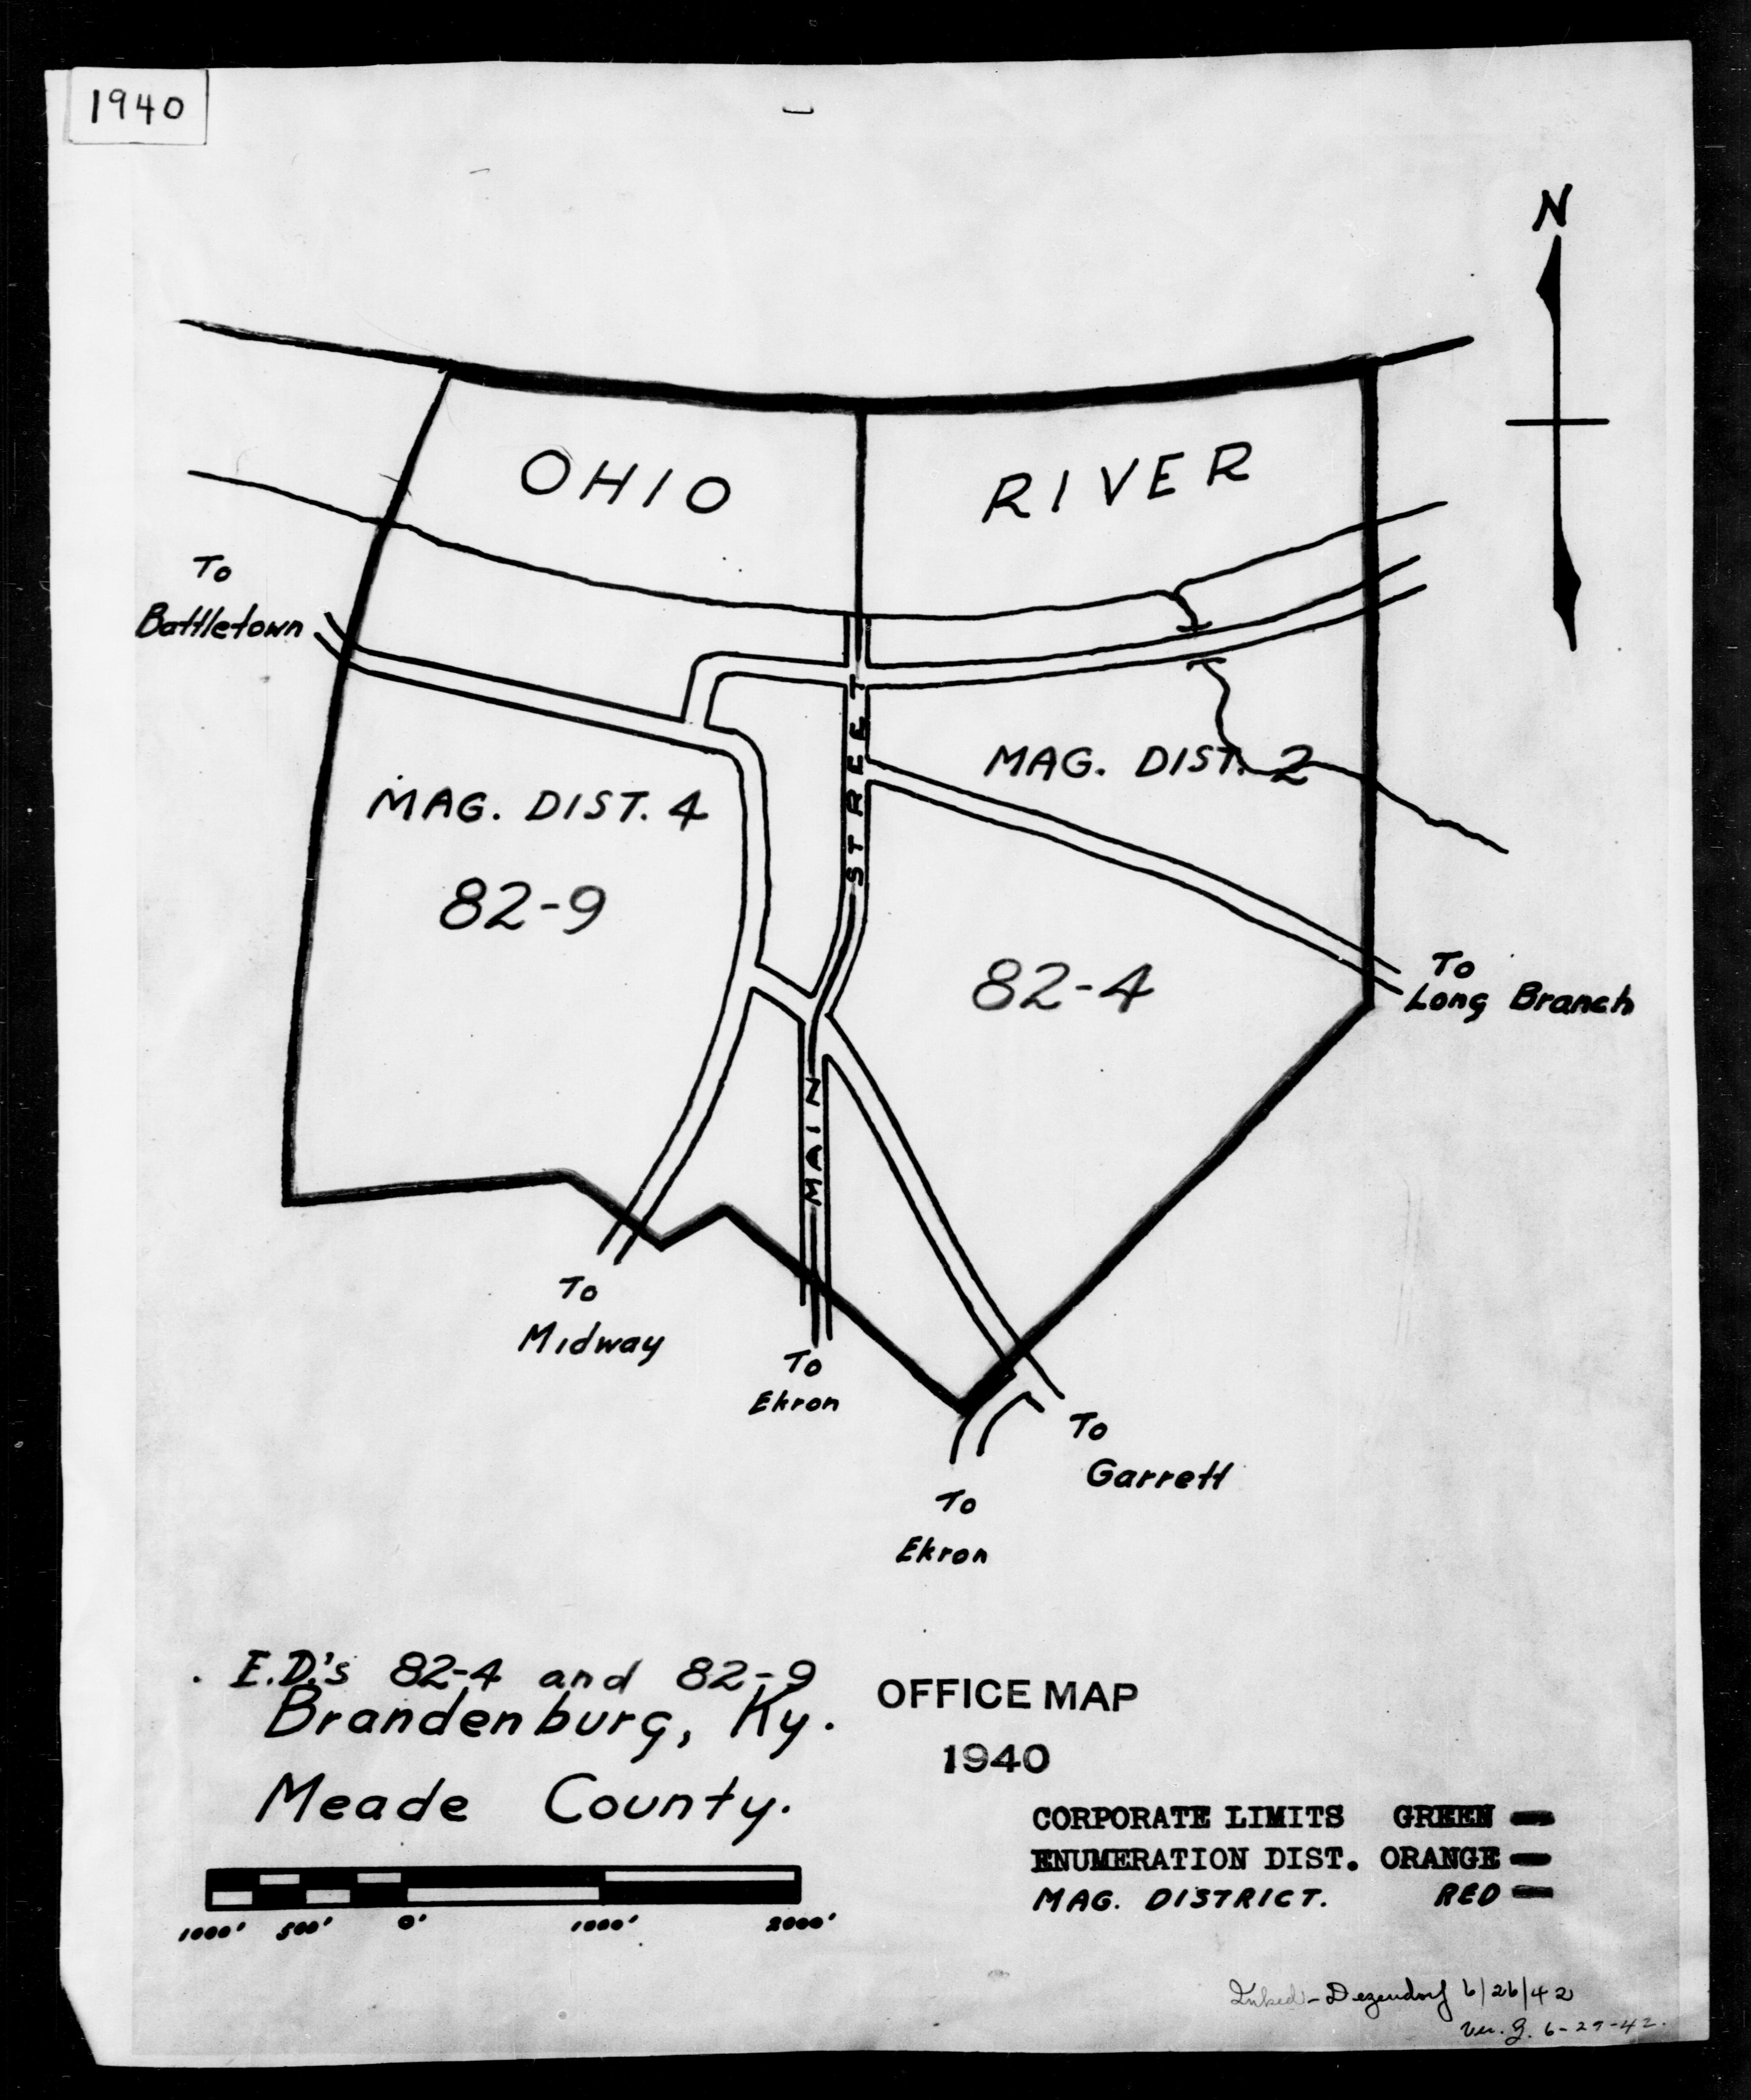 1940 Census Enumeration District Maps - Kentucky - Meade County - Brandenburg - ED 82-4, ED 82-9